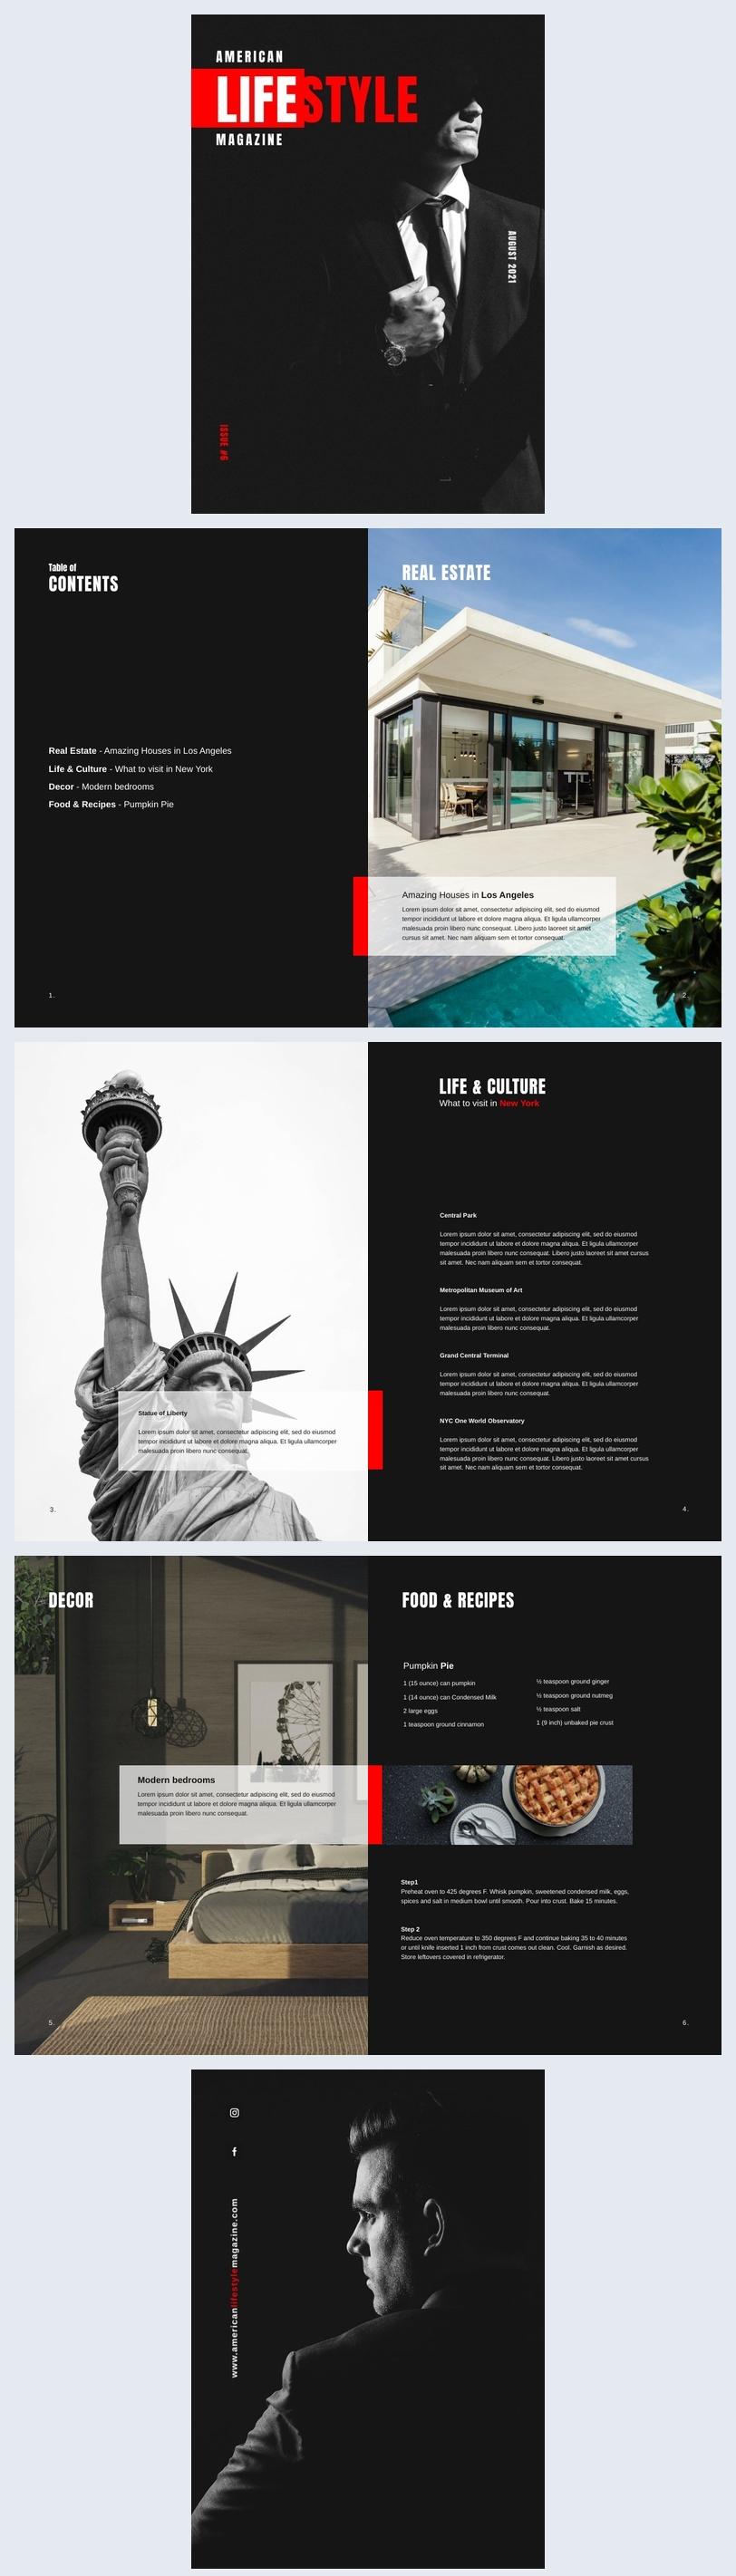 American Lifestyle Magazine Design Example